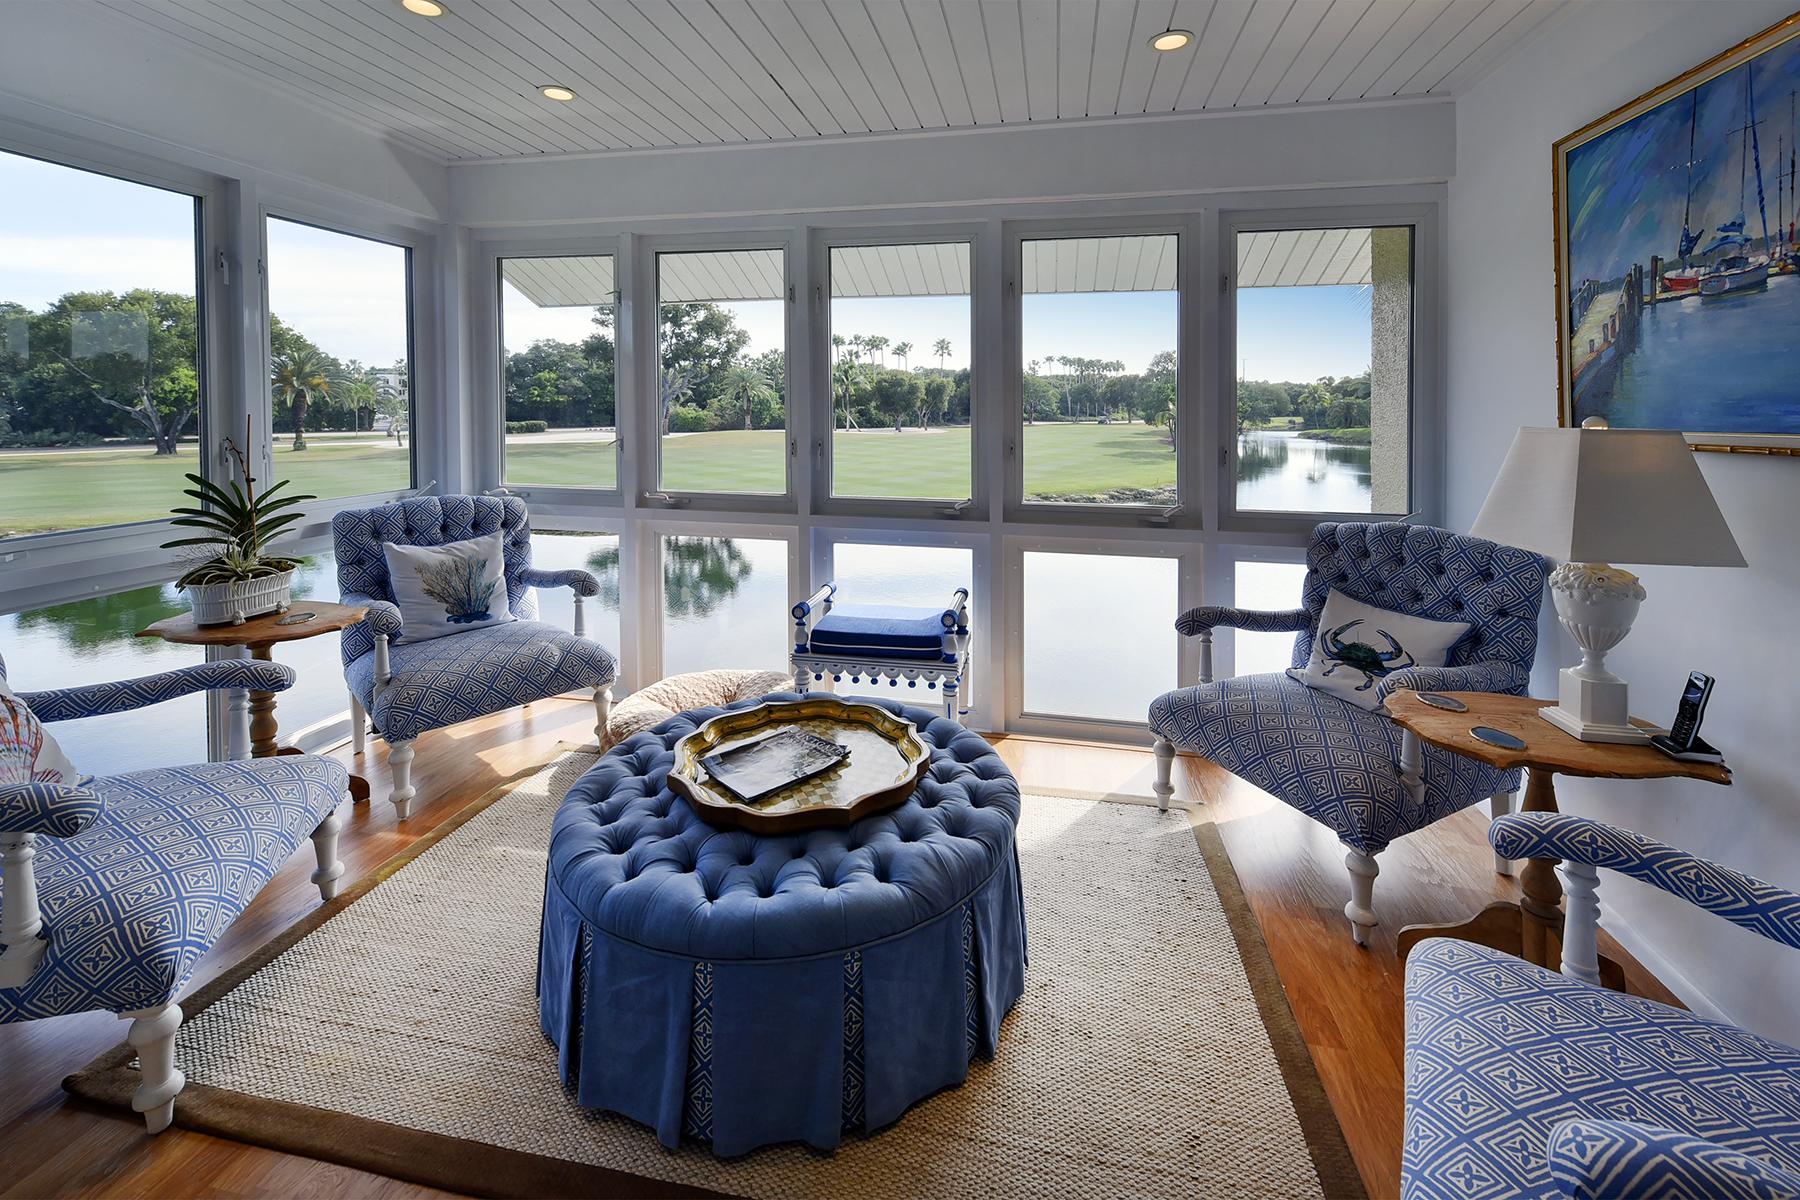 Property For Sale at Lakefront Condominium at Ocean Reef